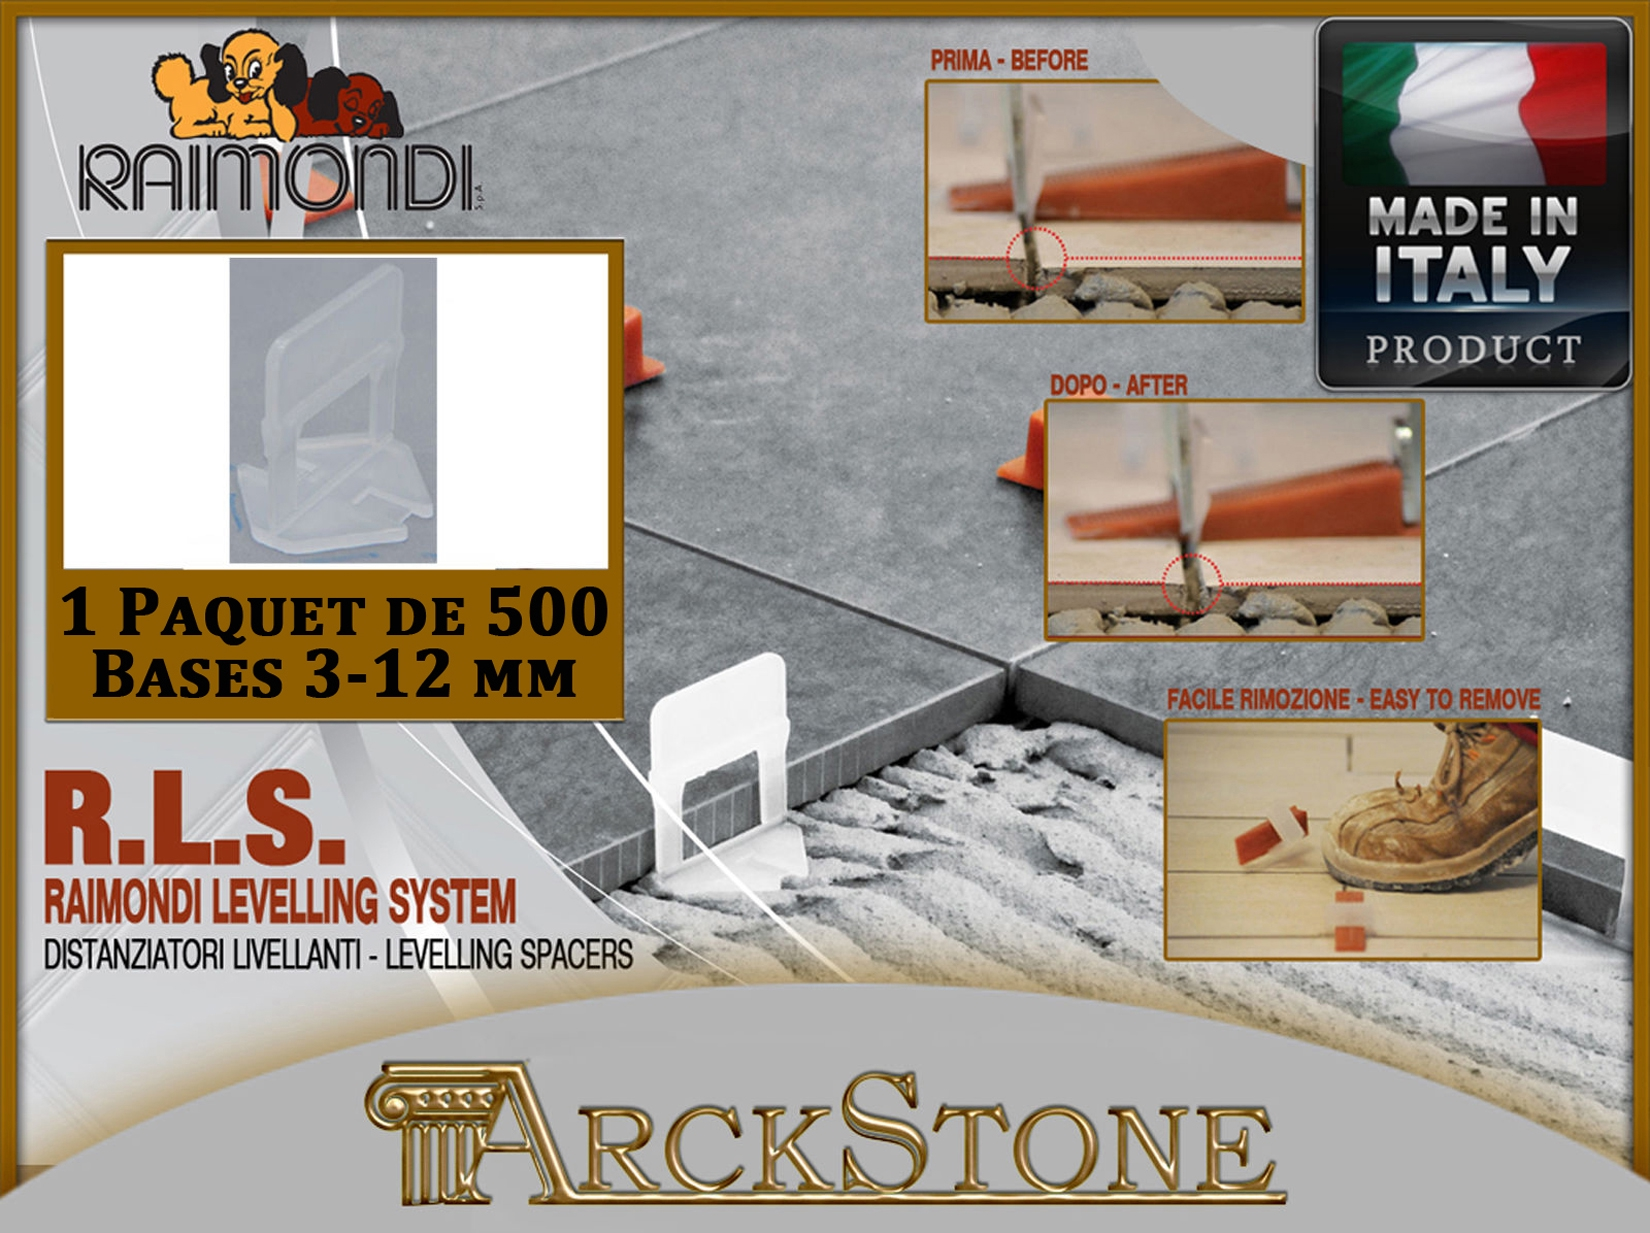 100 bases 3-12 mm ARCKSTONE Kit Seau 1 pince étage Raimondi RLS 100 cales